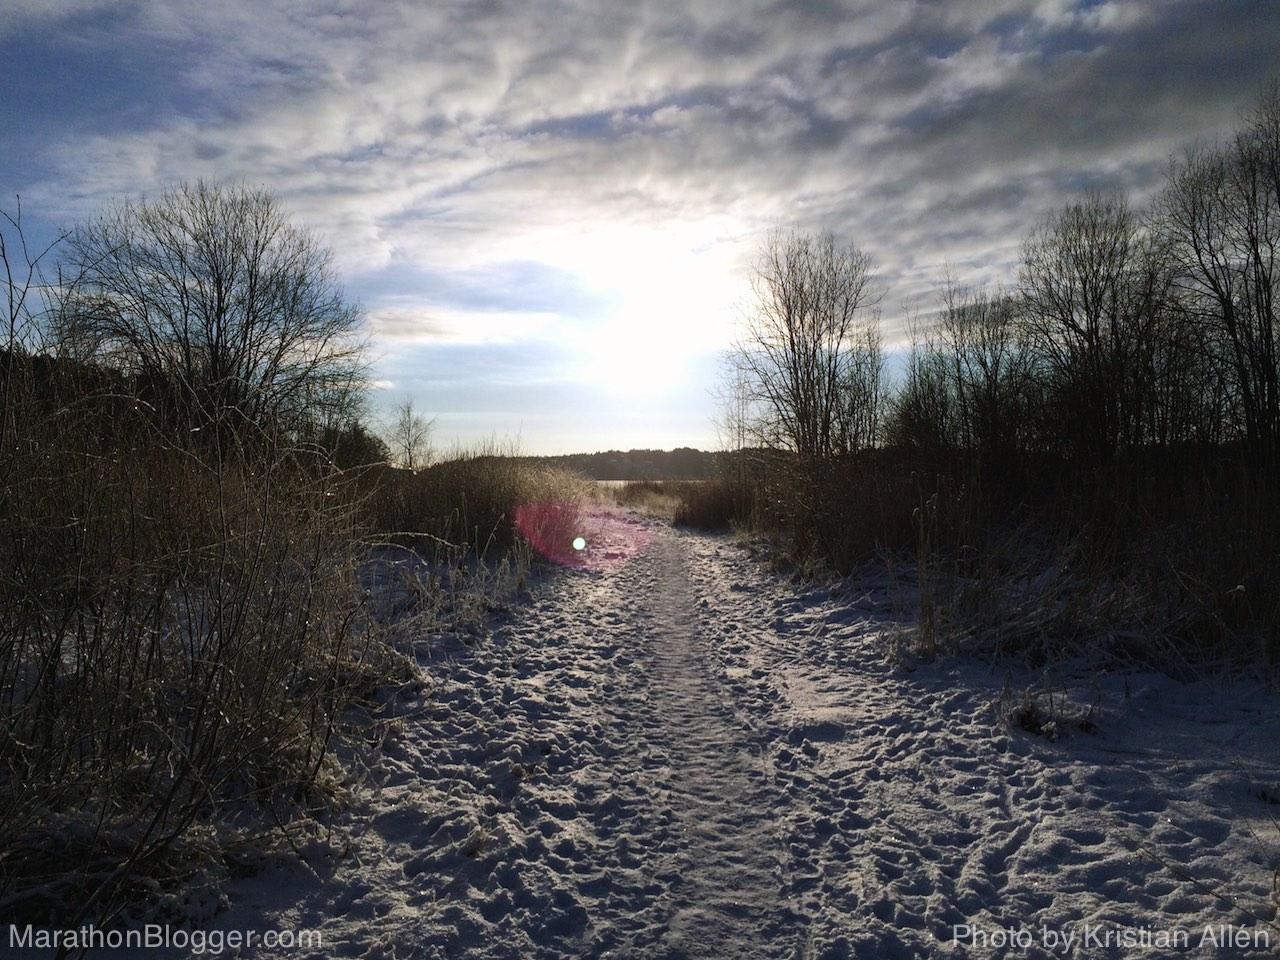 6.1.2015 13.22 km Run